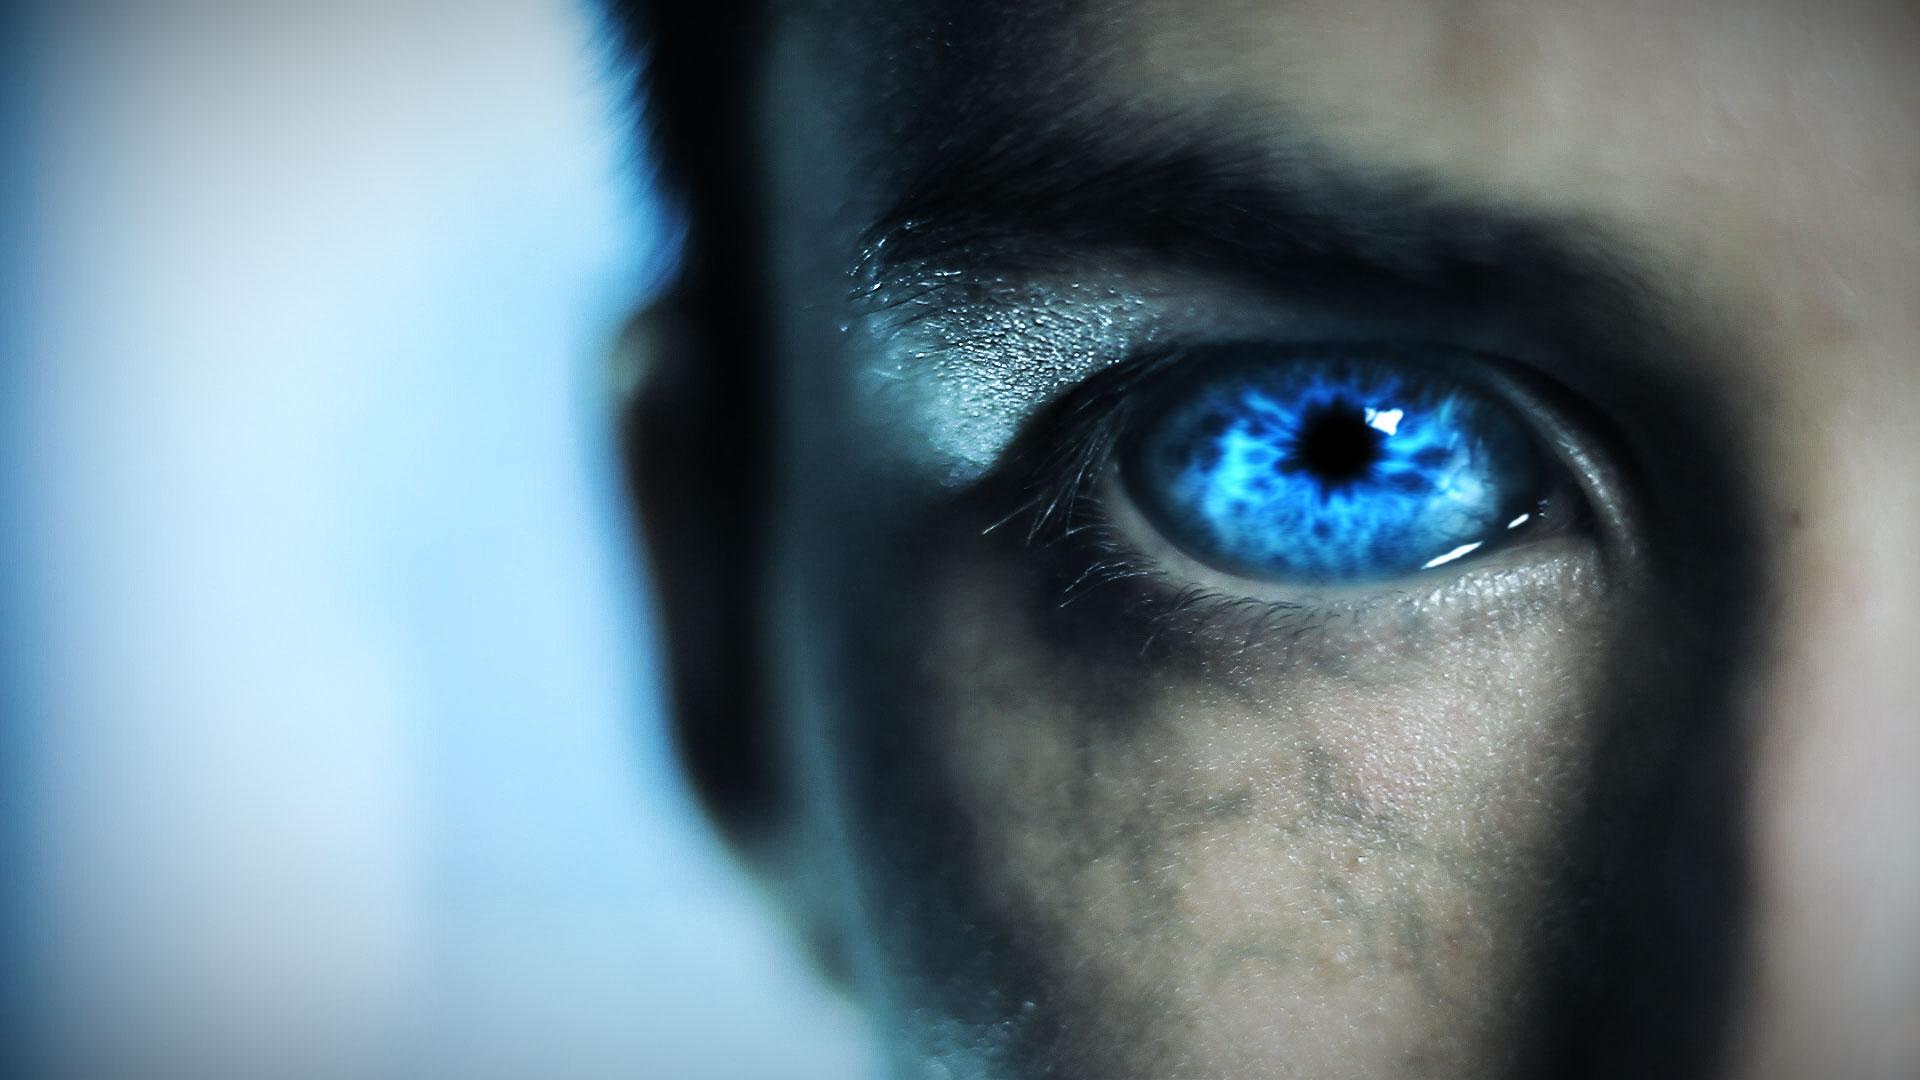 Professional VFX Software for Mac & PC - HitFilm Pro